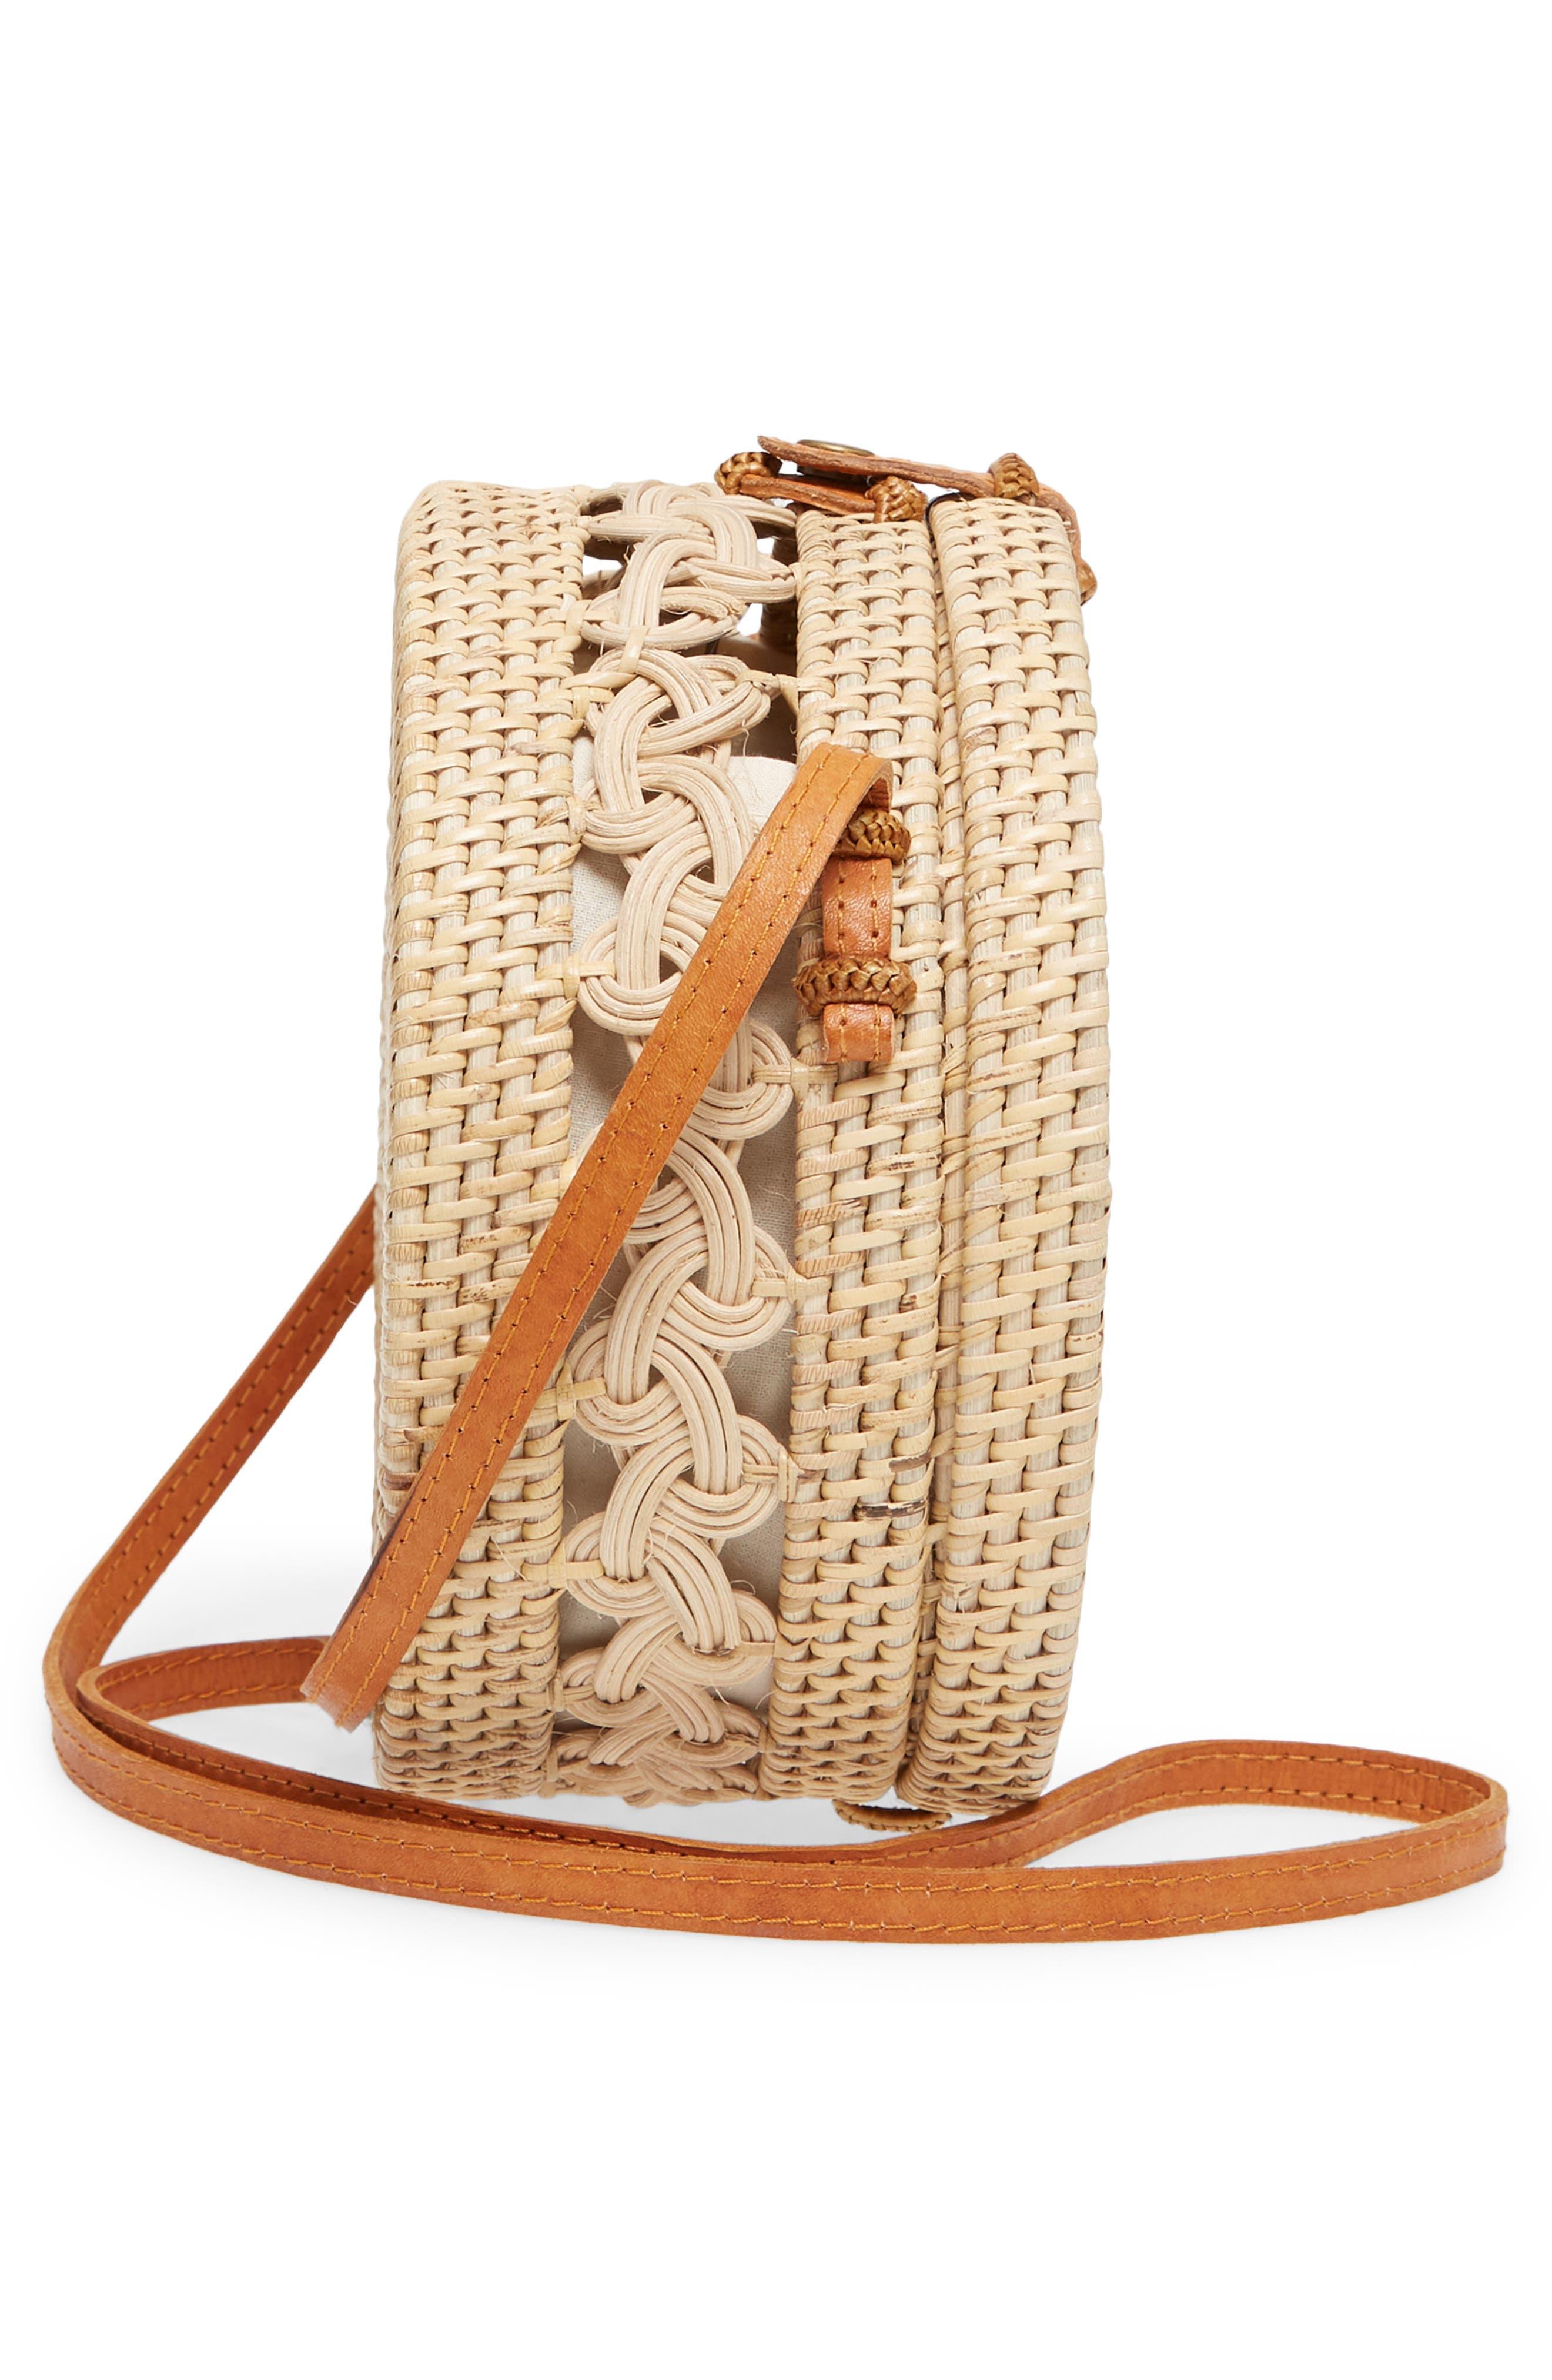 Woven Rattan Circle Crossbody Bag,                             Alternate thumbnail 5, color,                             Lighter Tan/ Natural